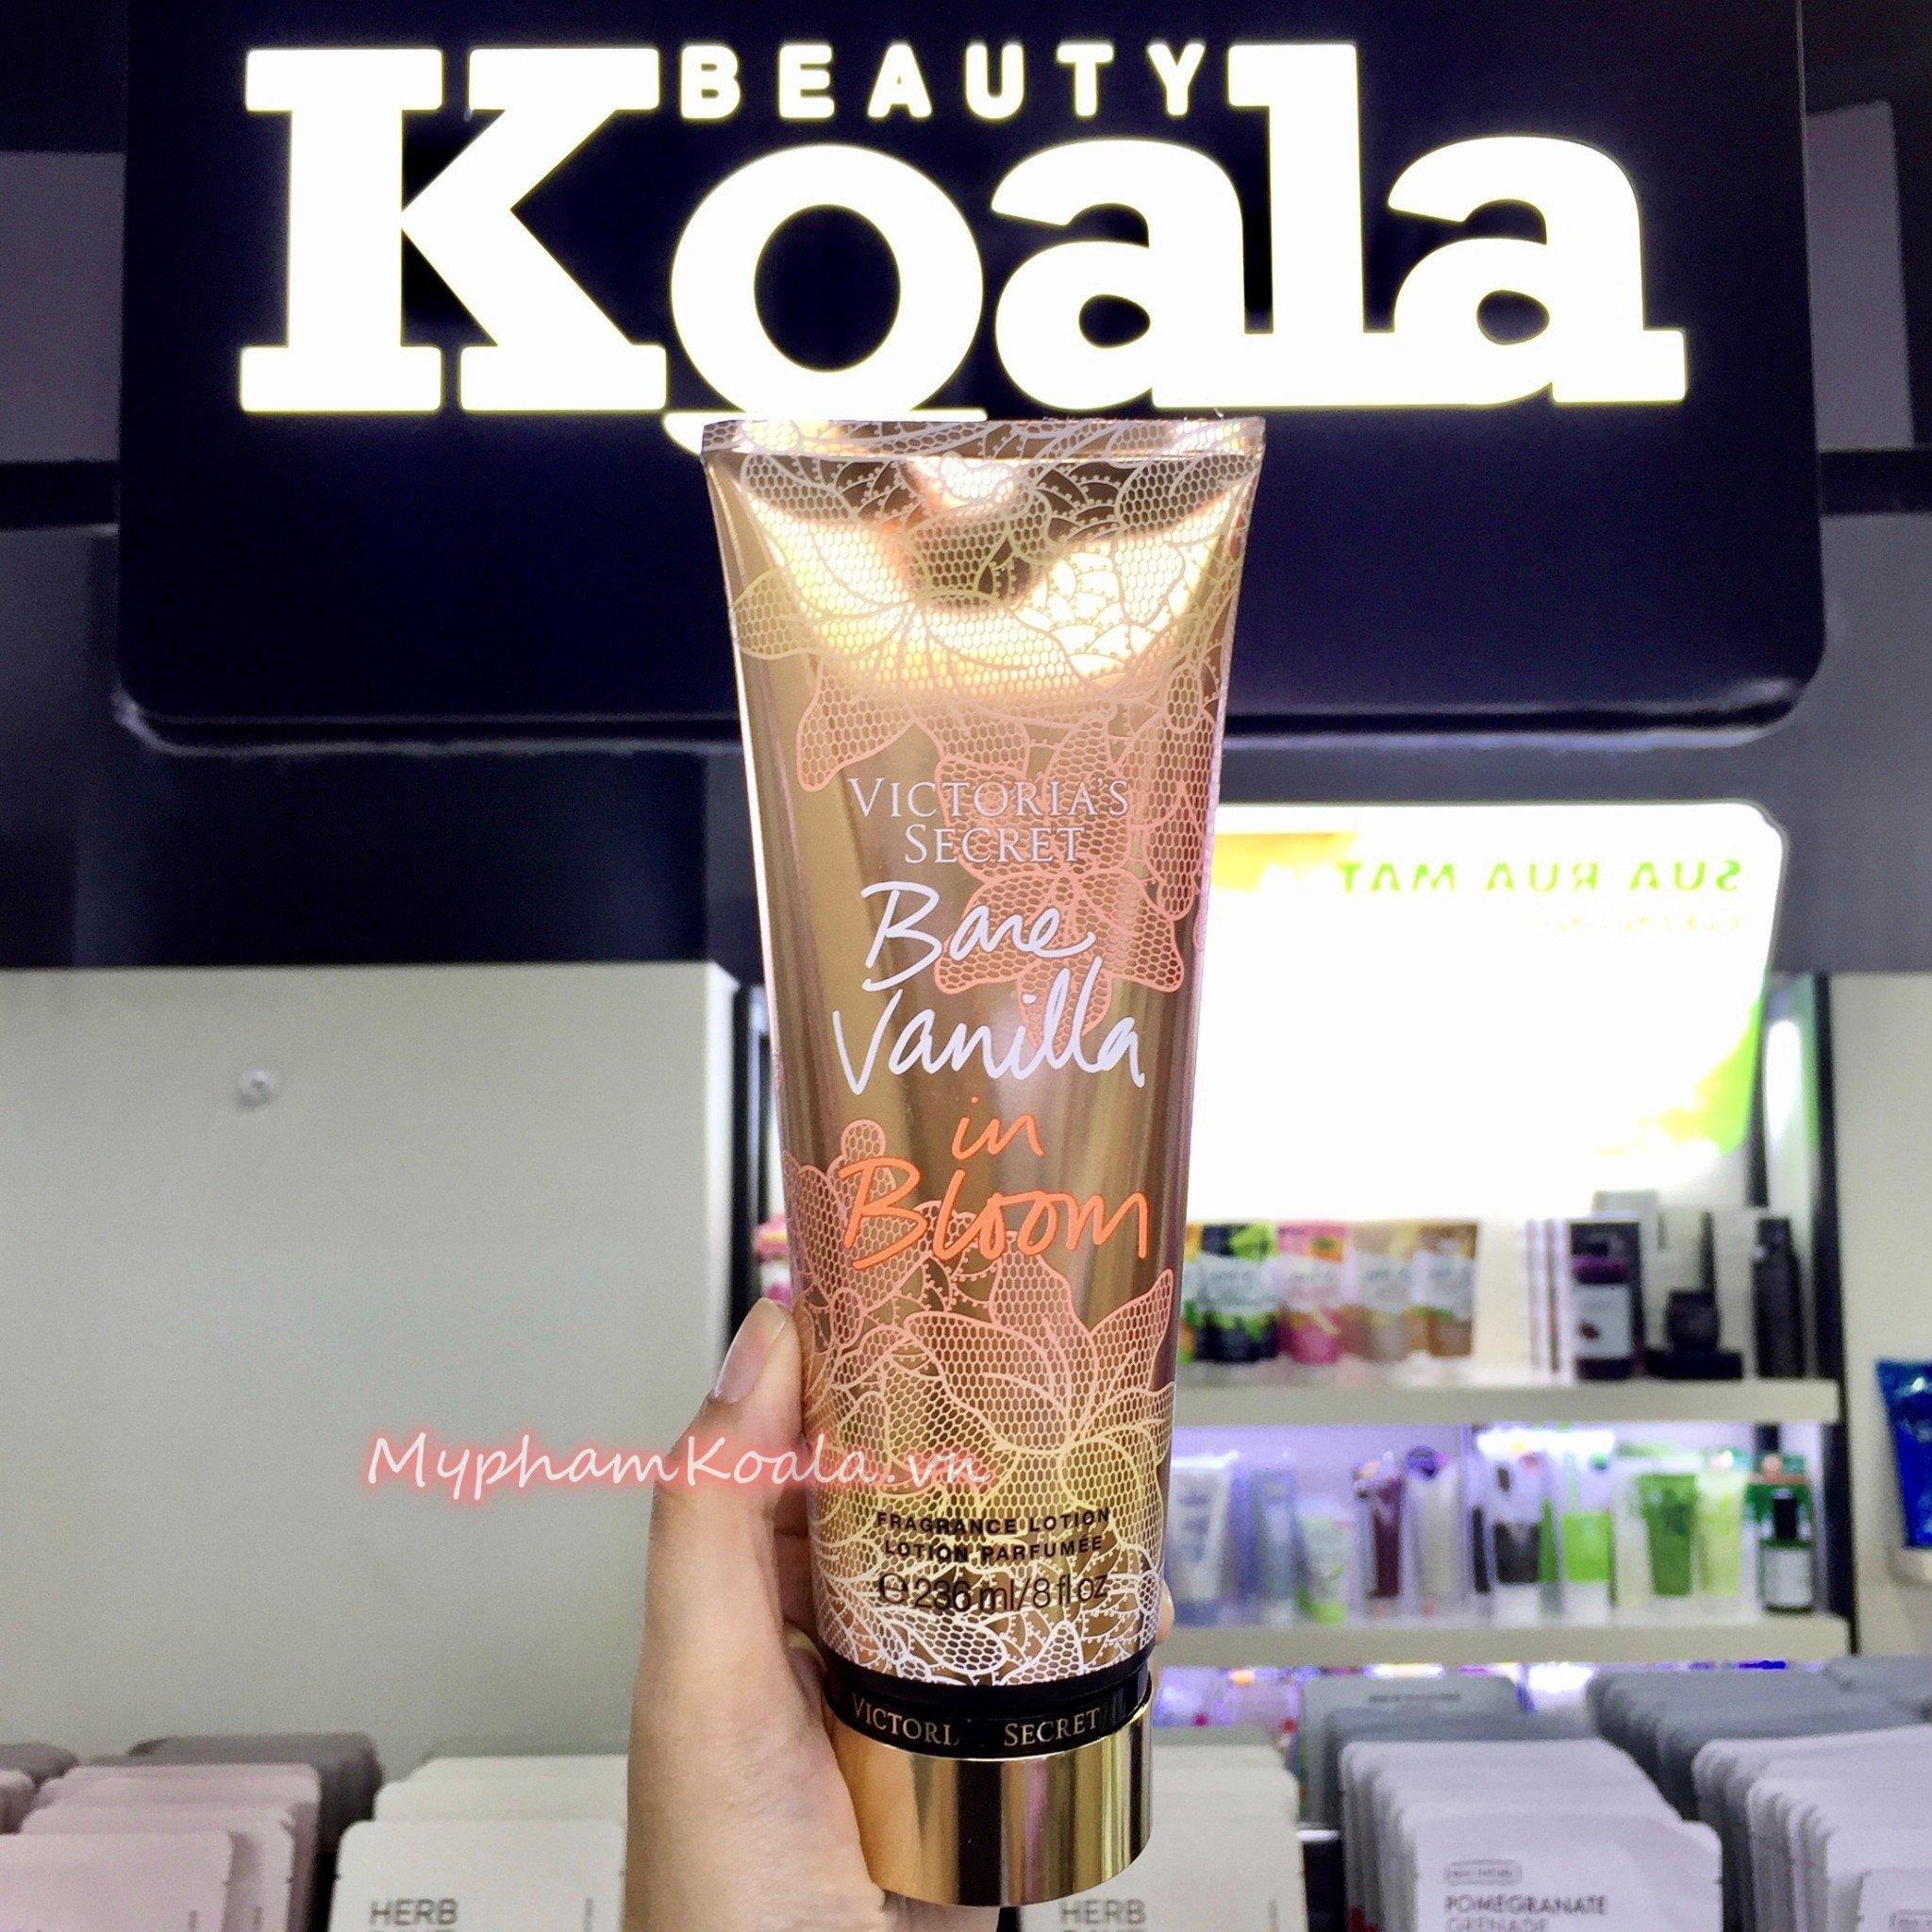 NEW ! Dưỡng Thể Nước Hoa Victoria's Secret IN BLOOM Fragrance Lotion 236ml